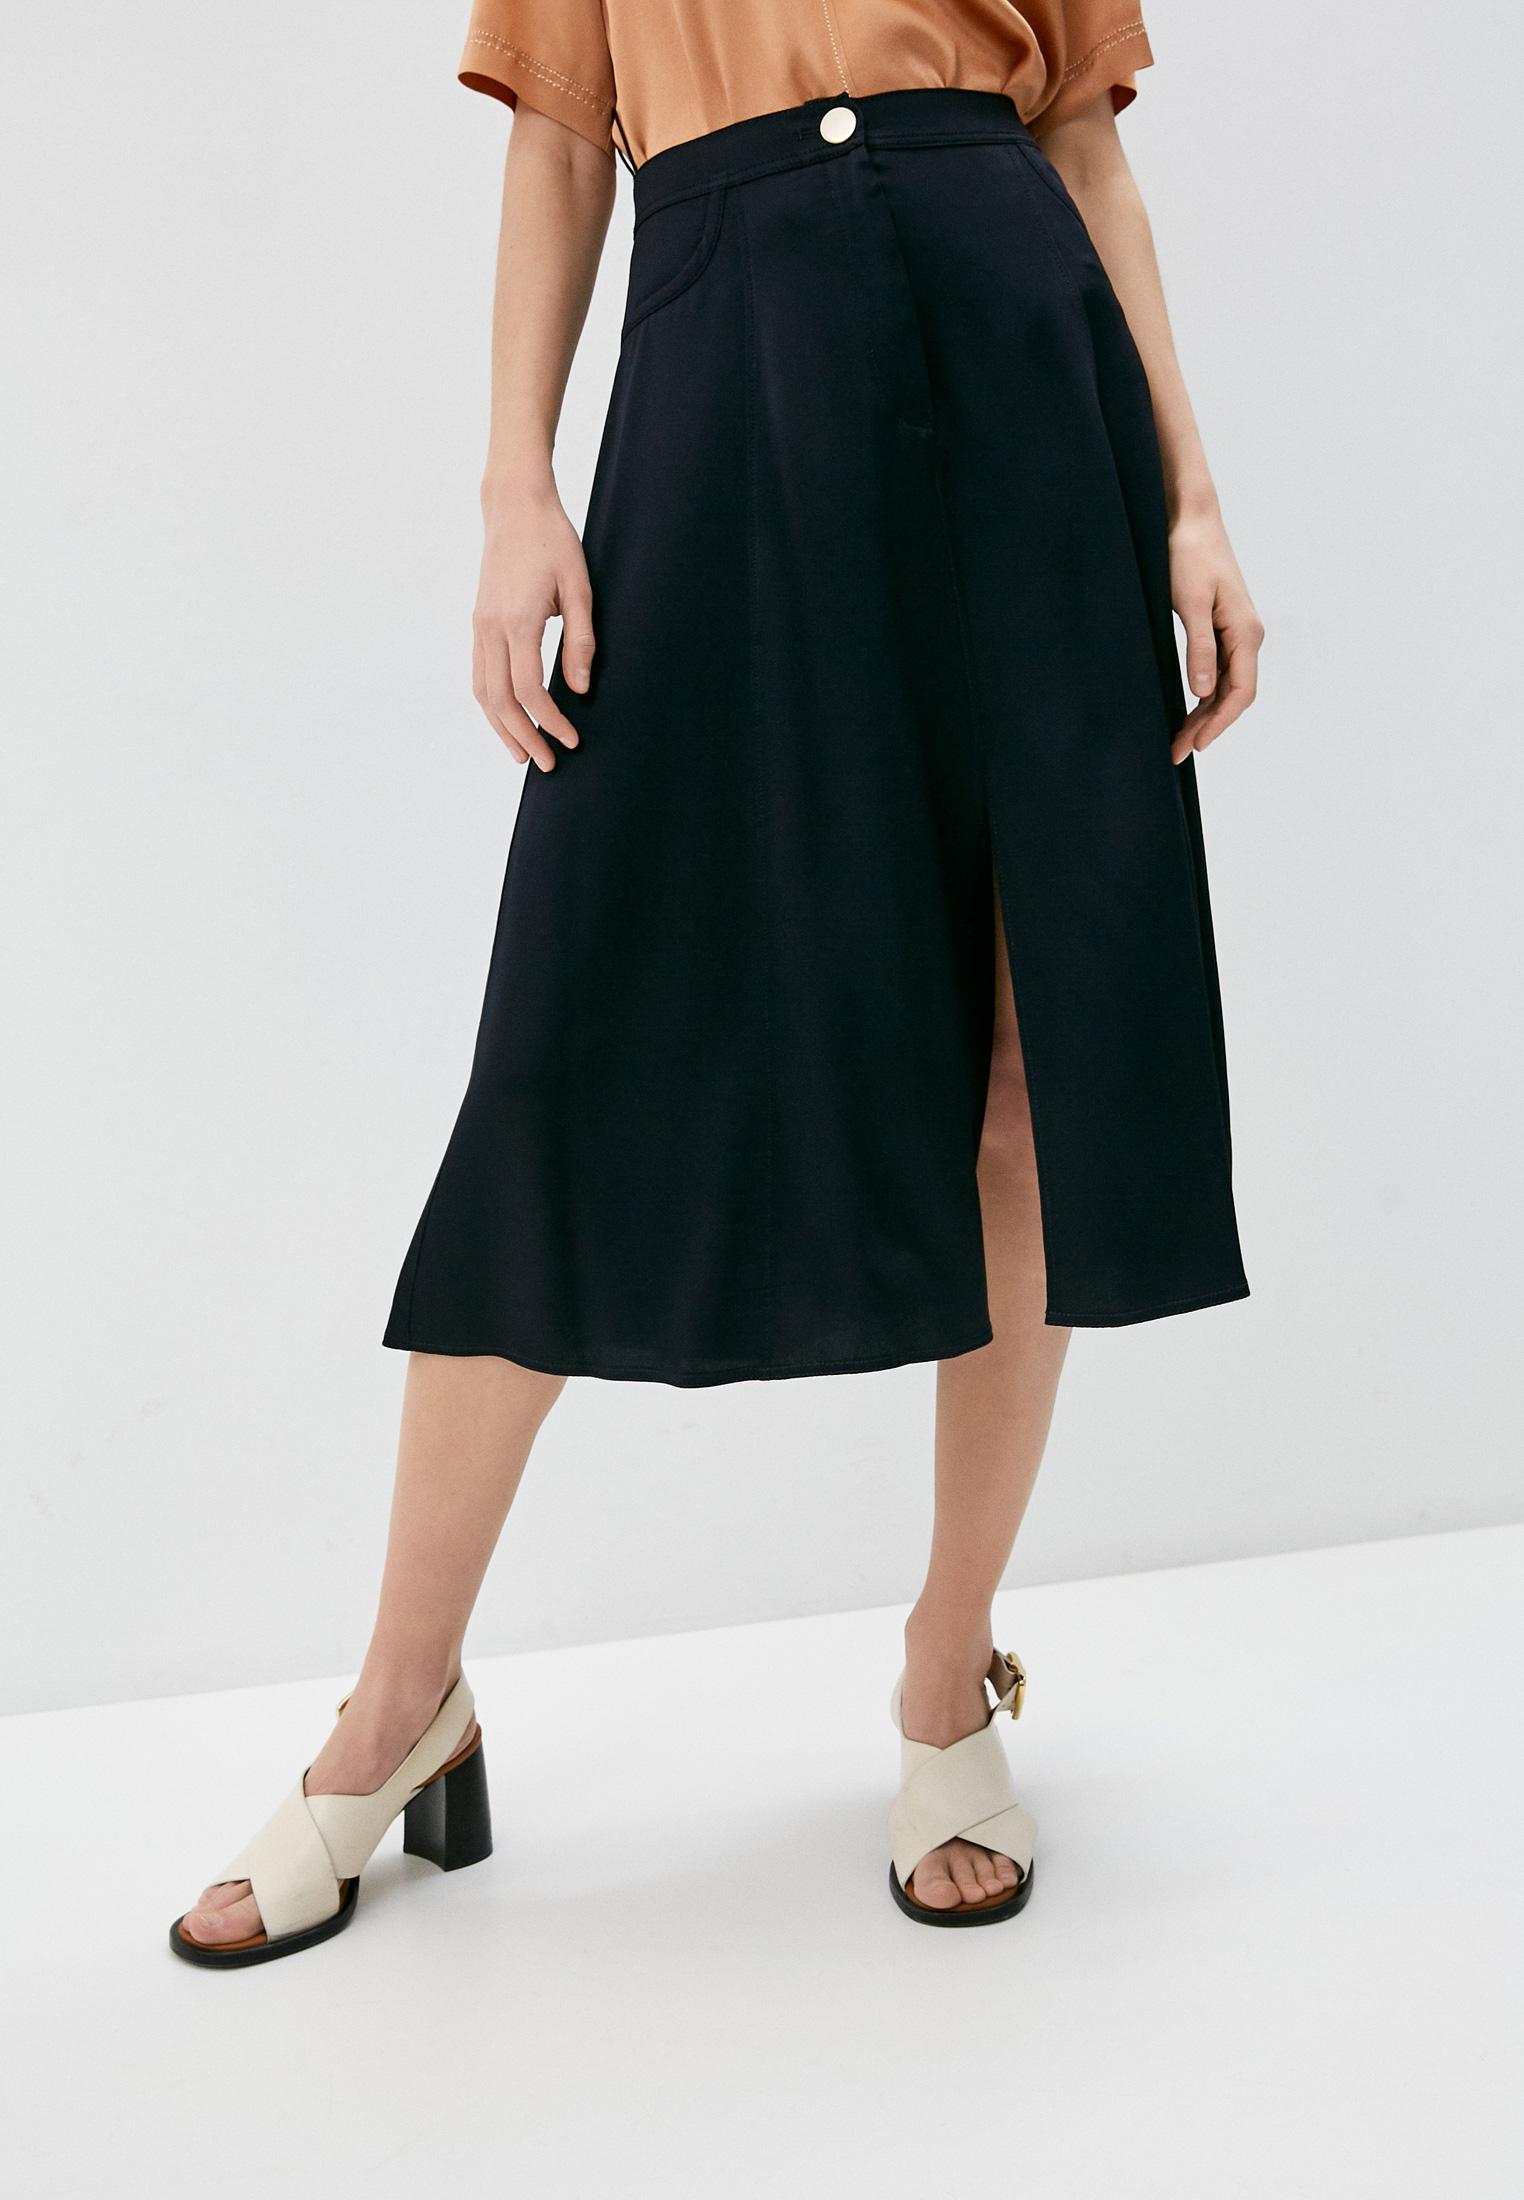 Широкая юбка Forte Forte 8051_my skirt